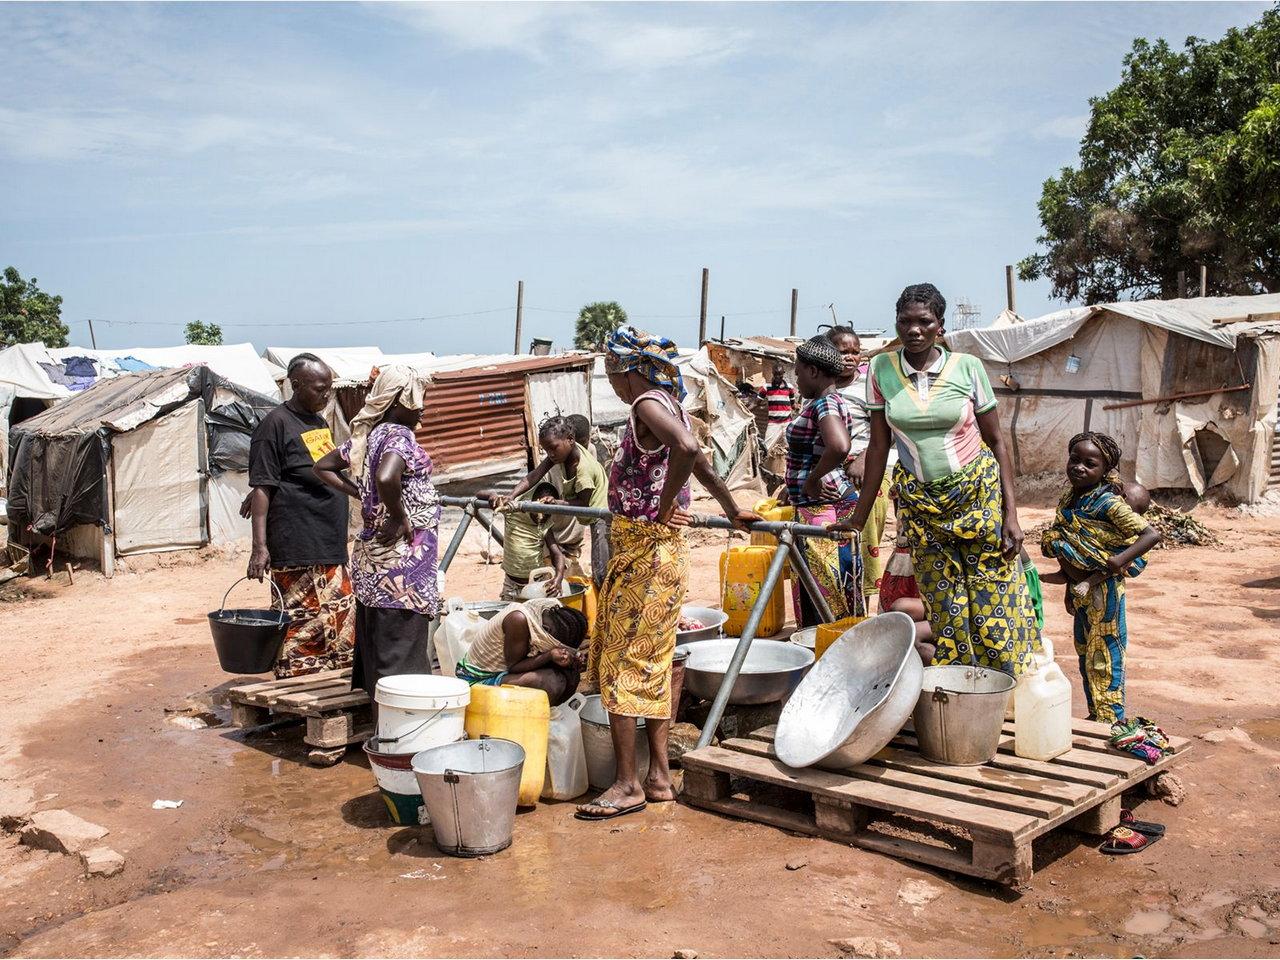 Центральная африка фото